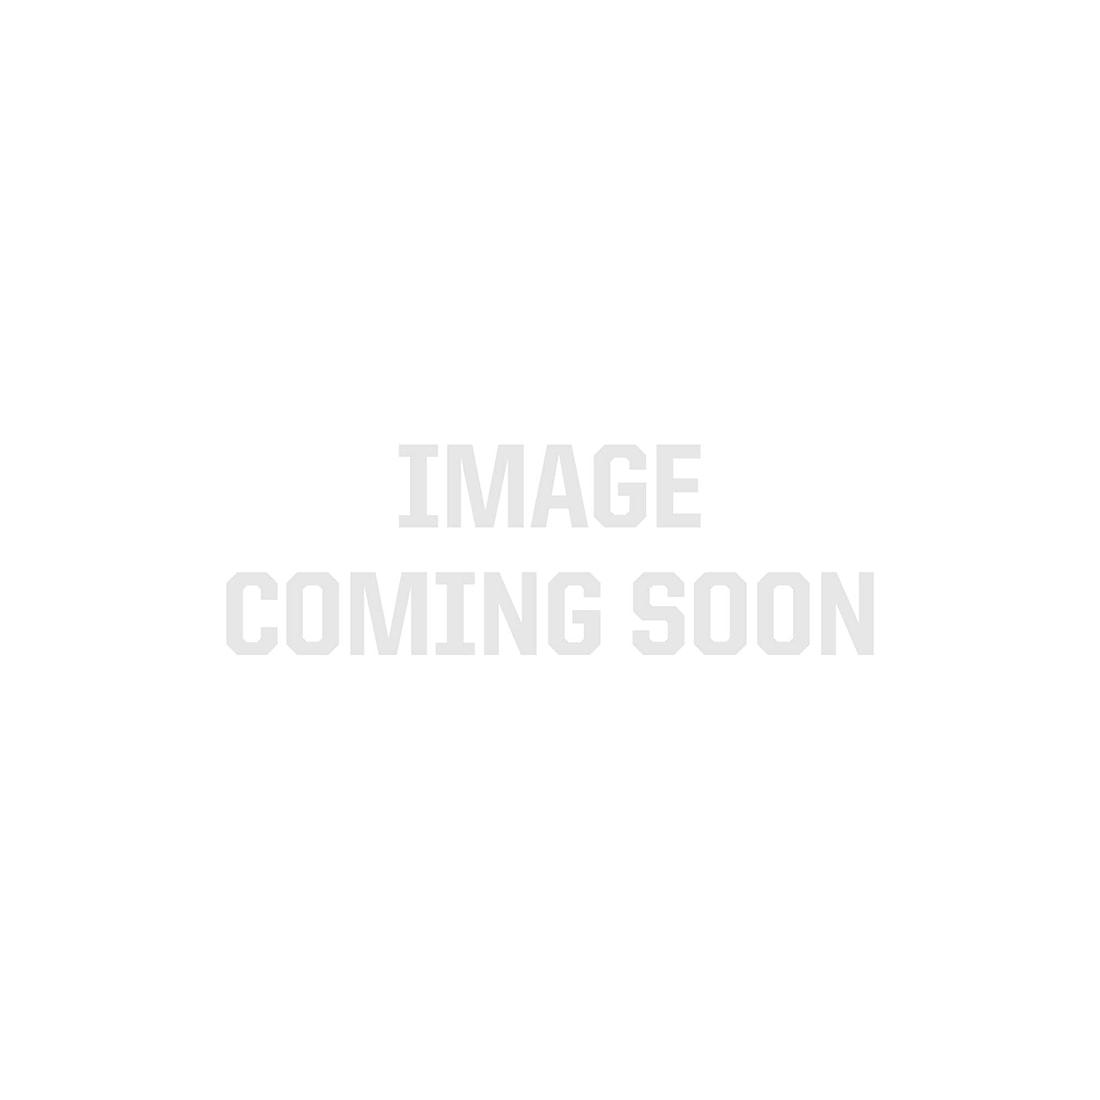 LumenMax 2835 LED Strip Light - 5,000K - 240/m - CurrentControl - Sample Kit